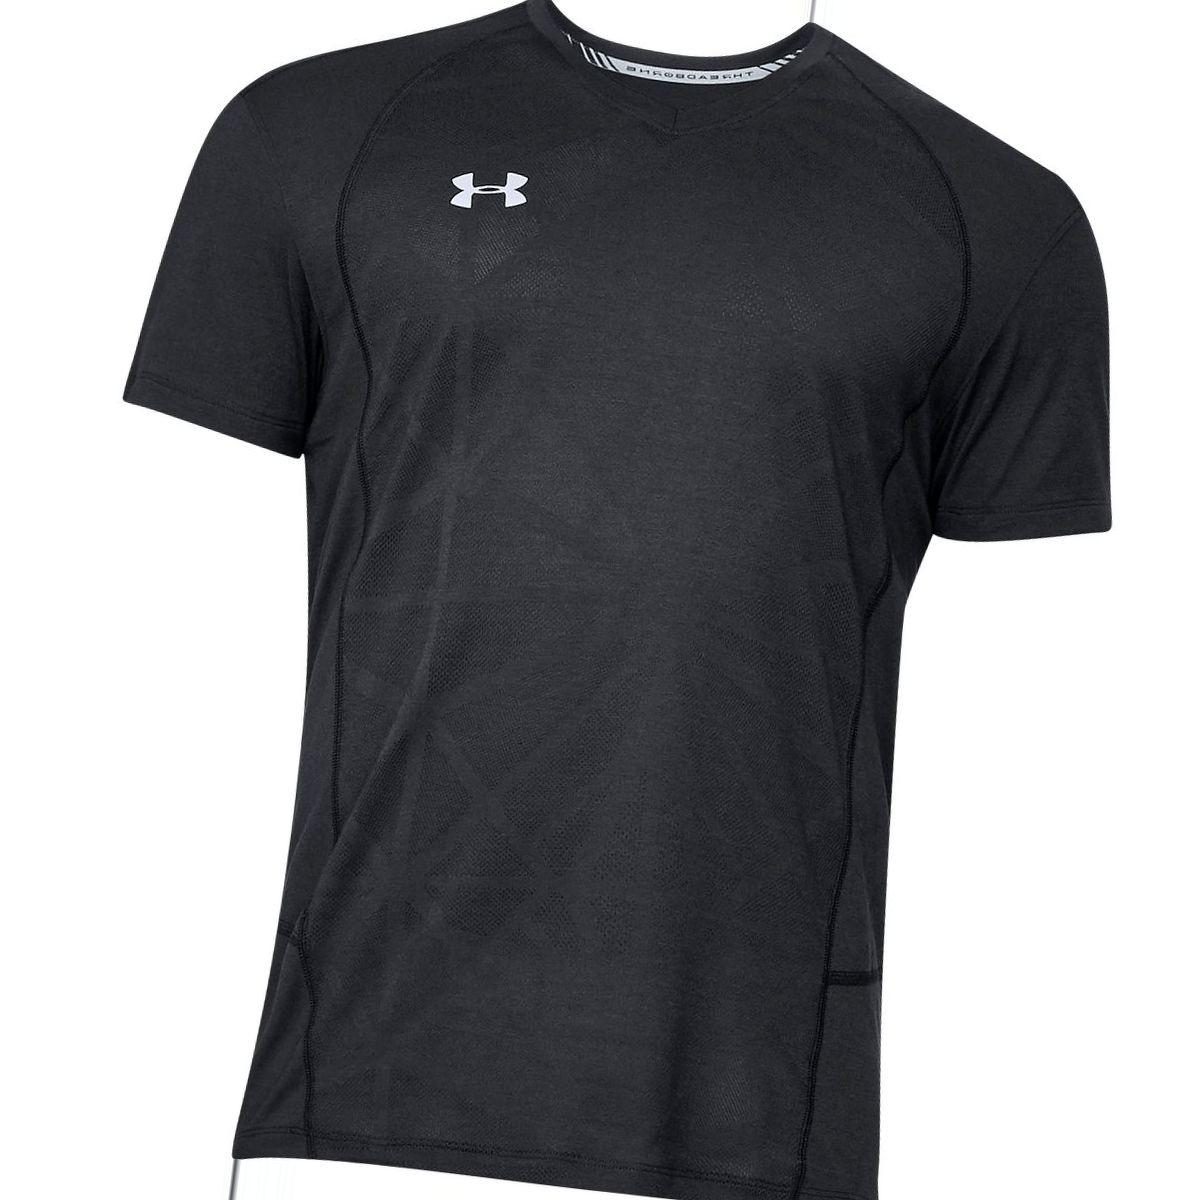 Under Armour Swyft V-Neck Shirt - Men's